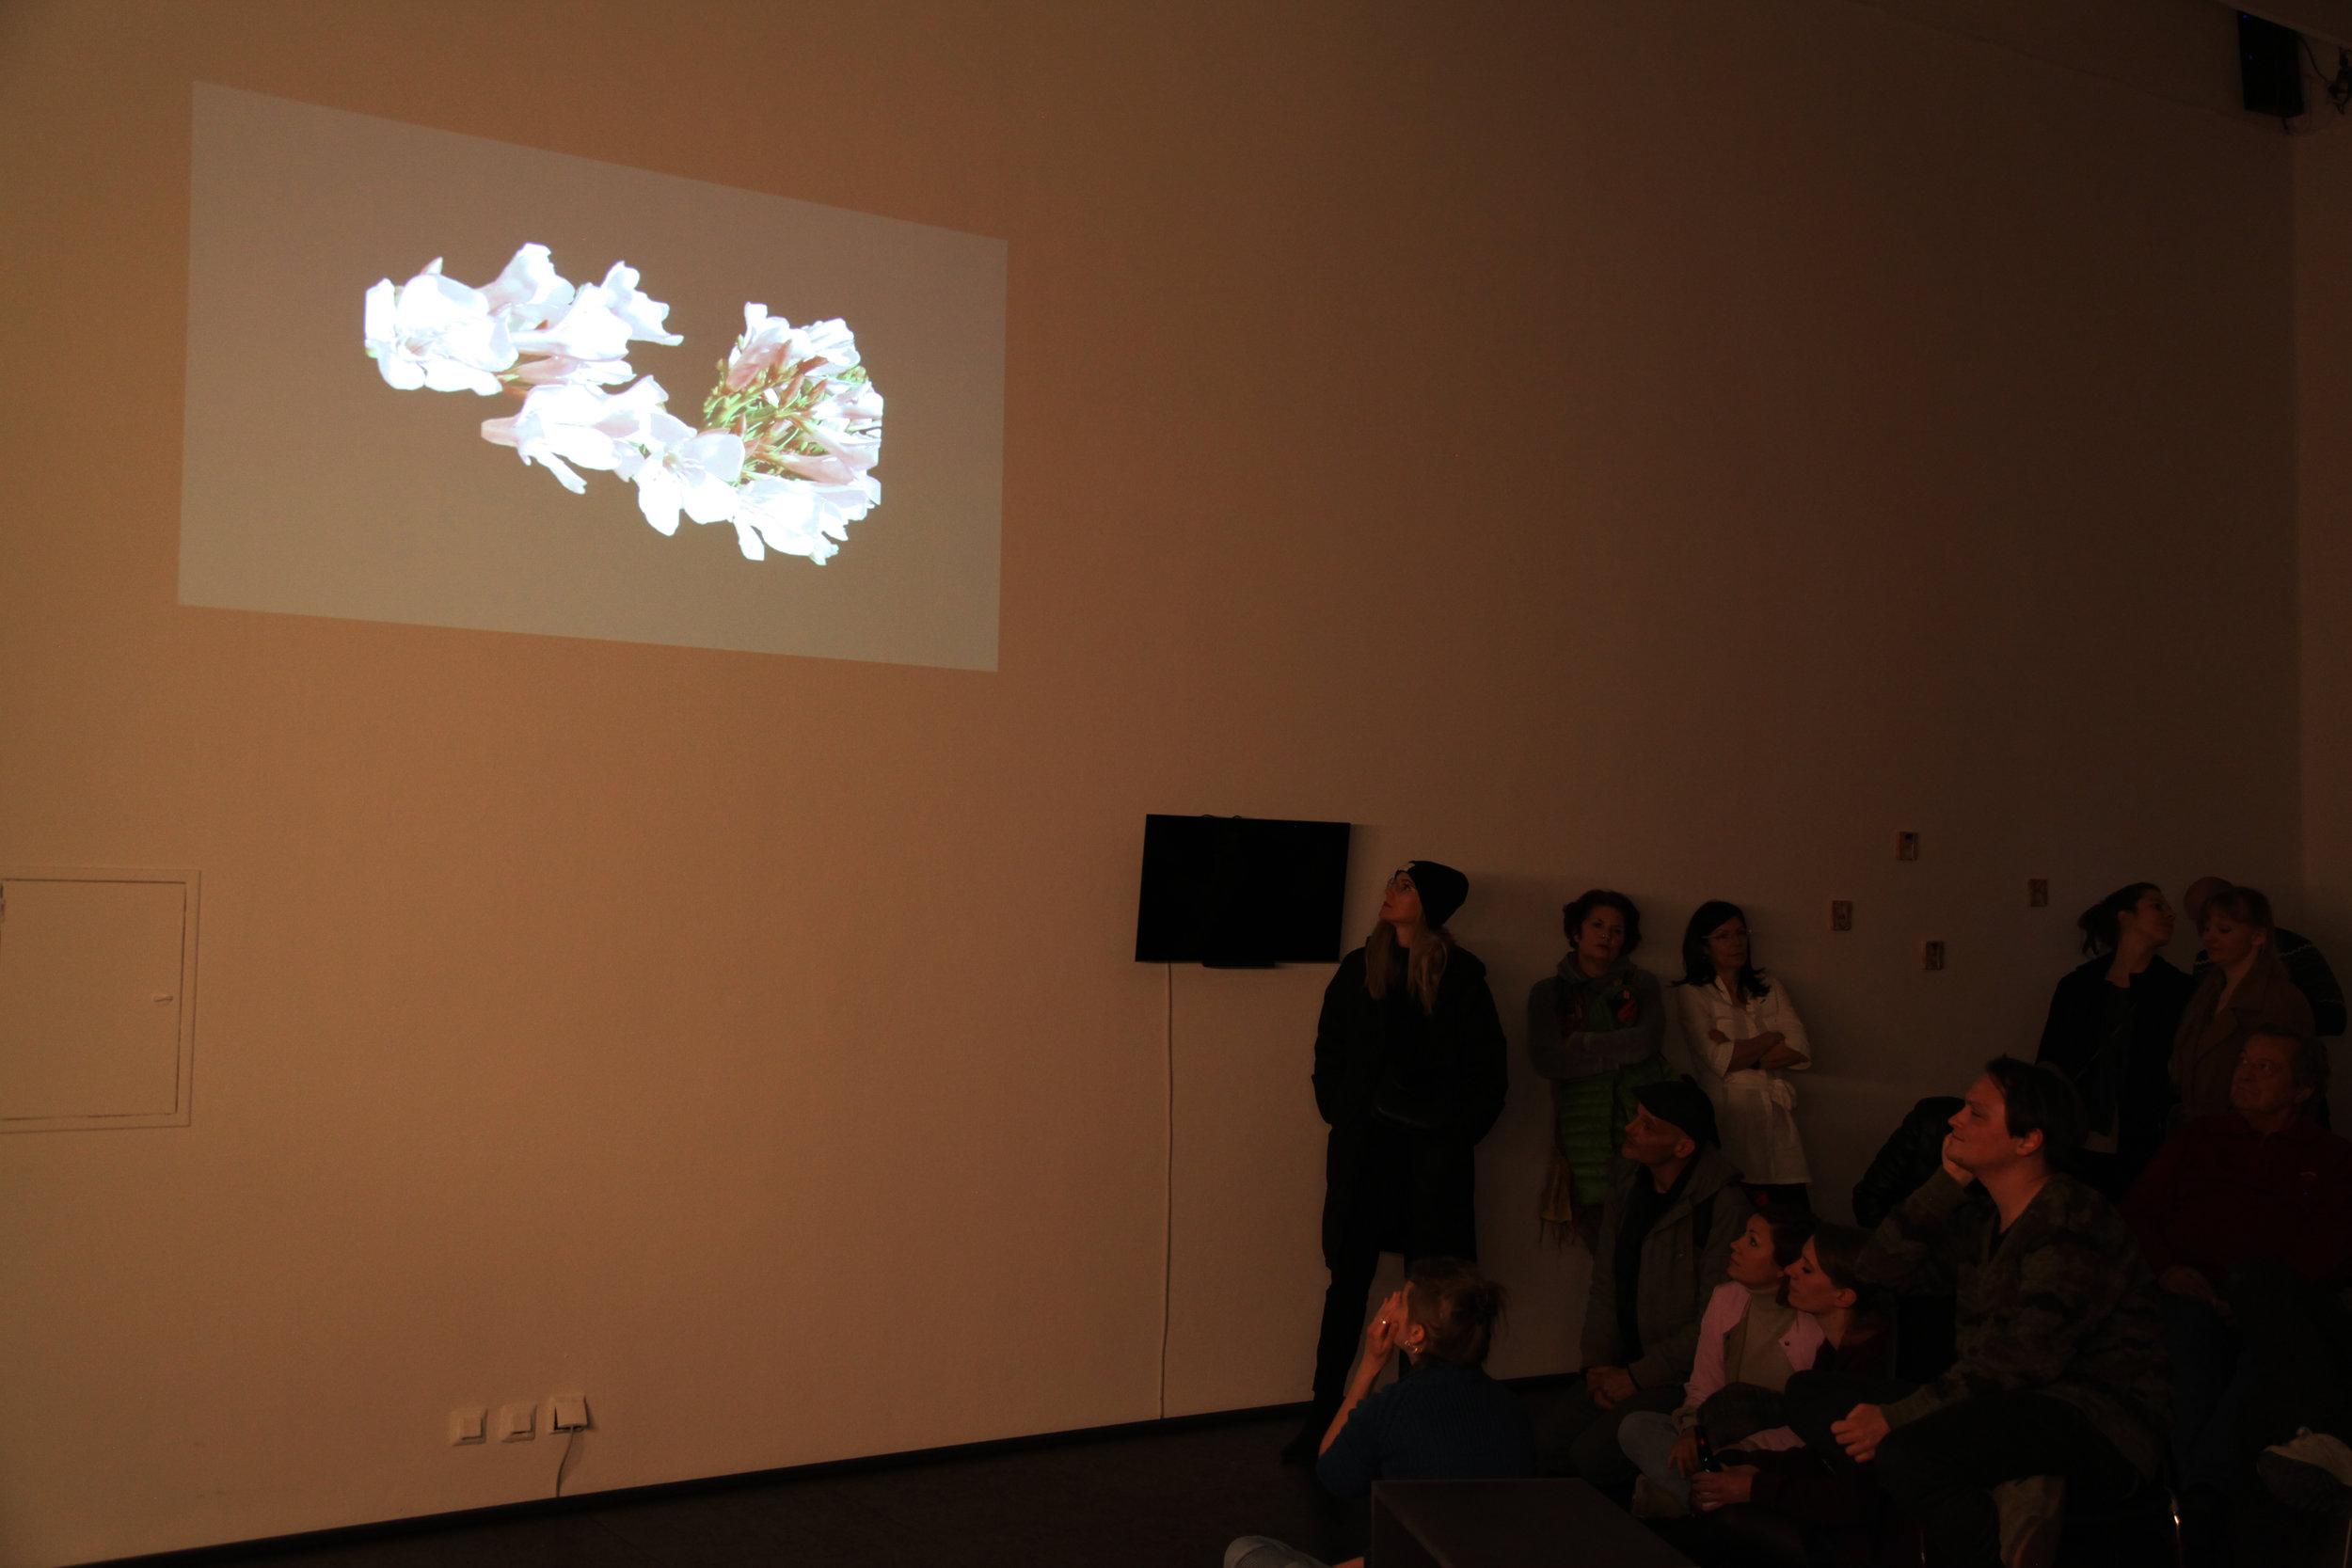 Audiovisual by Ashkan Sepahvand,The oleander the same  Photo: Jacopo Miliani